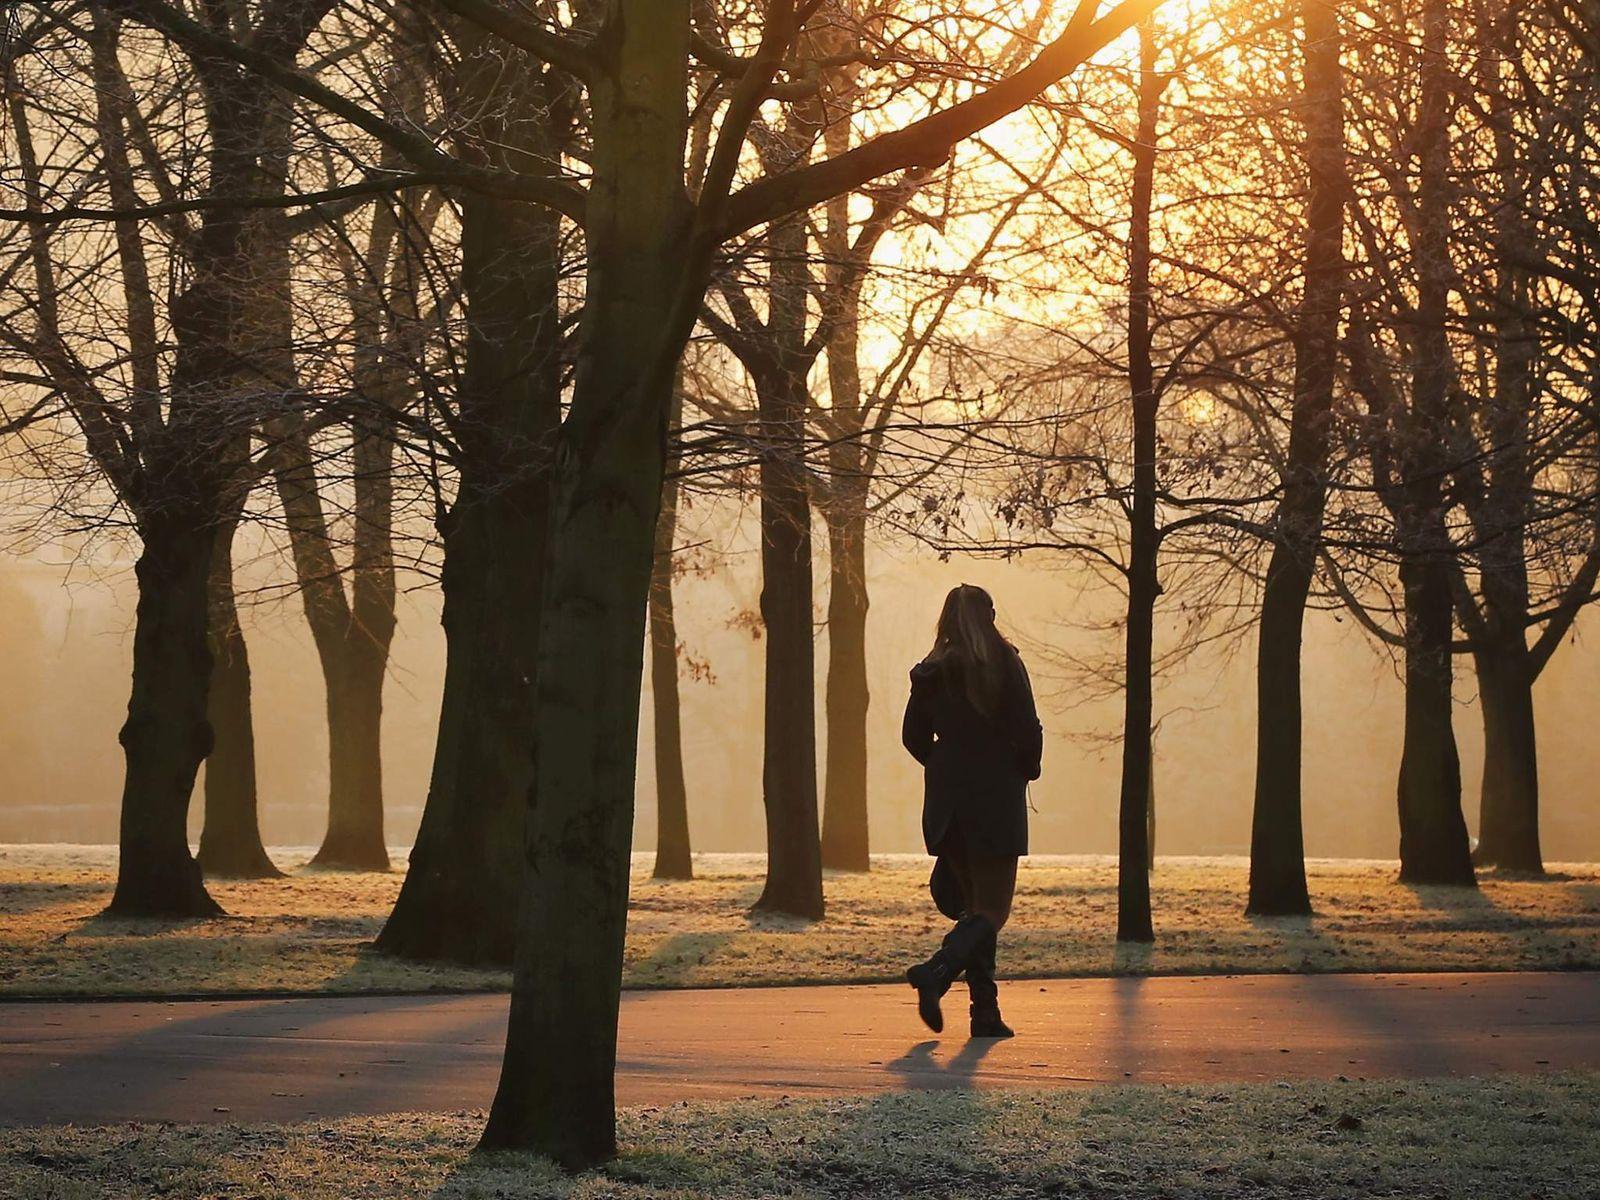 Прогулки снижают риск сердечных заболеваний